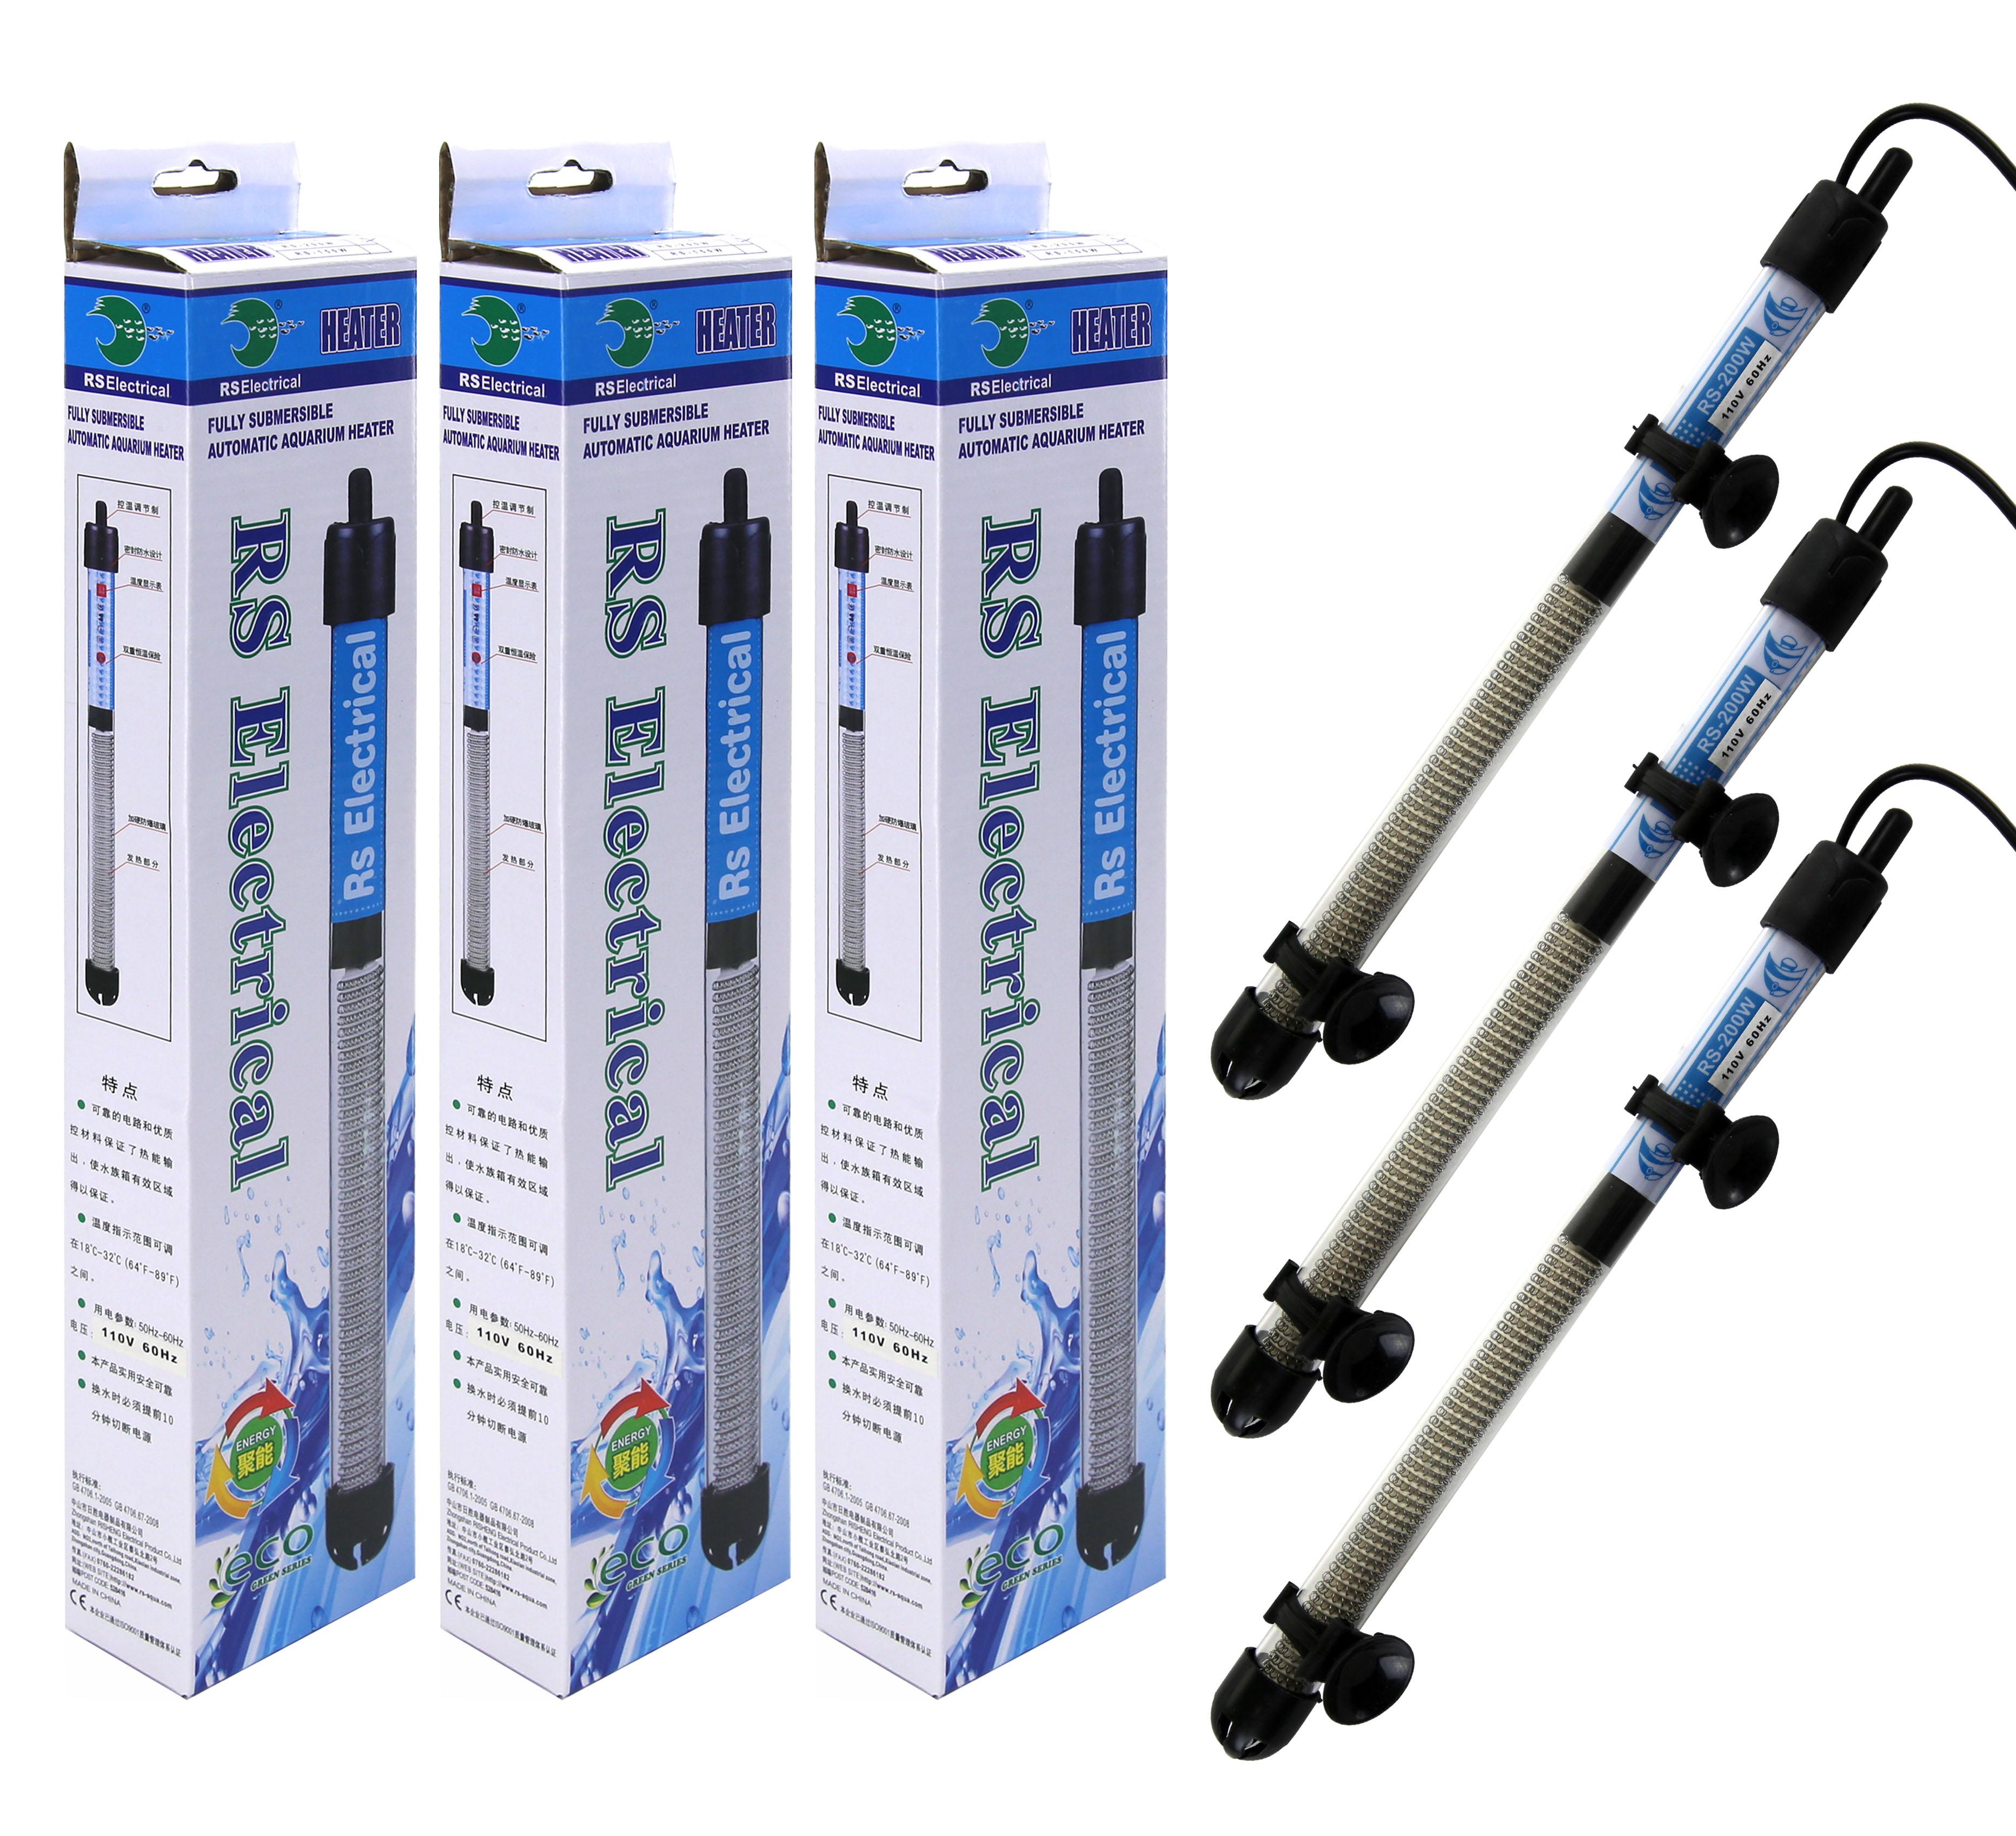 3 pieces Aquarium Heater Submersible Anti-Explosion Fish Tank Water Heater 200W